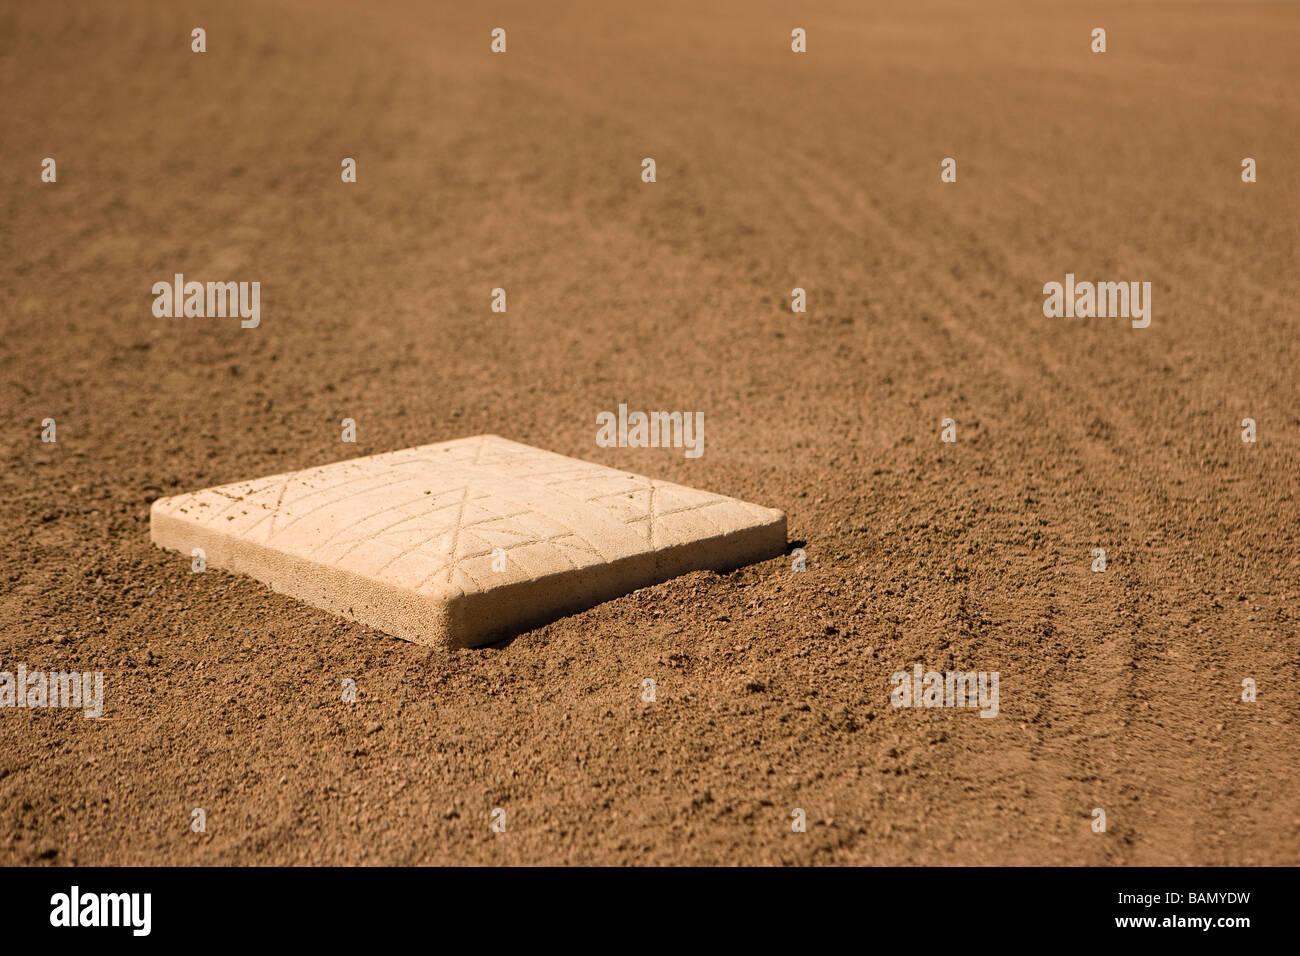 Safety - baseball concepts - Stock Image